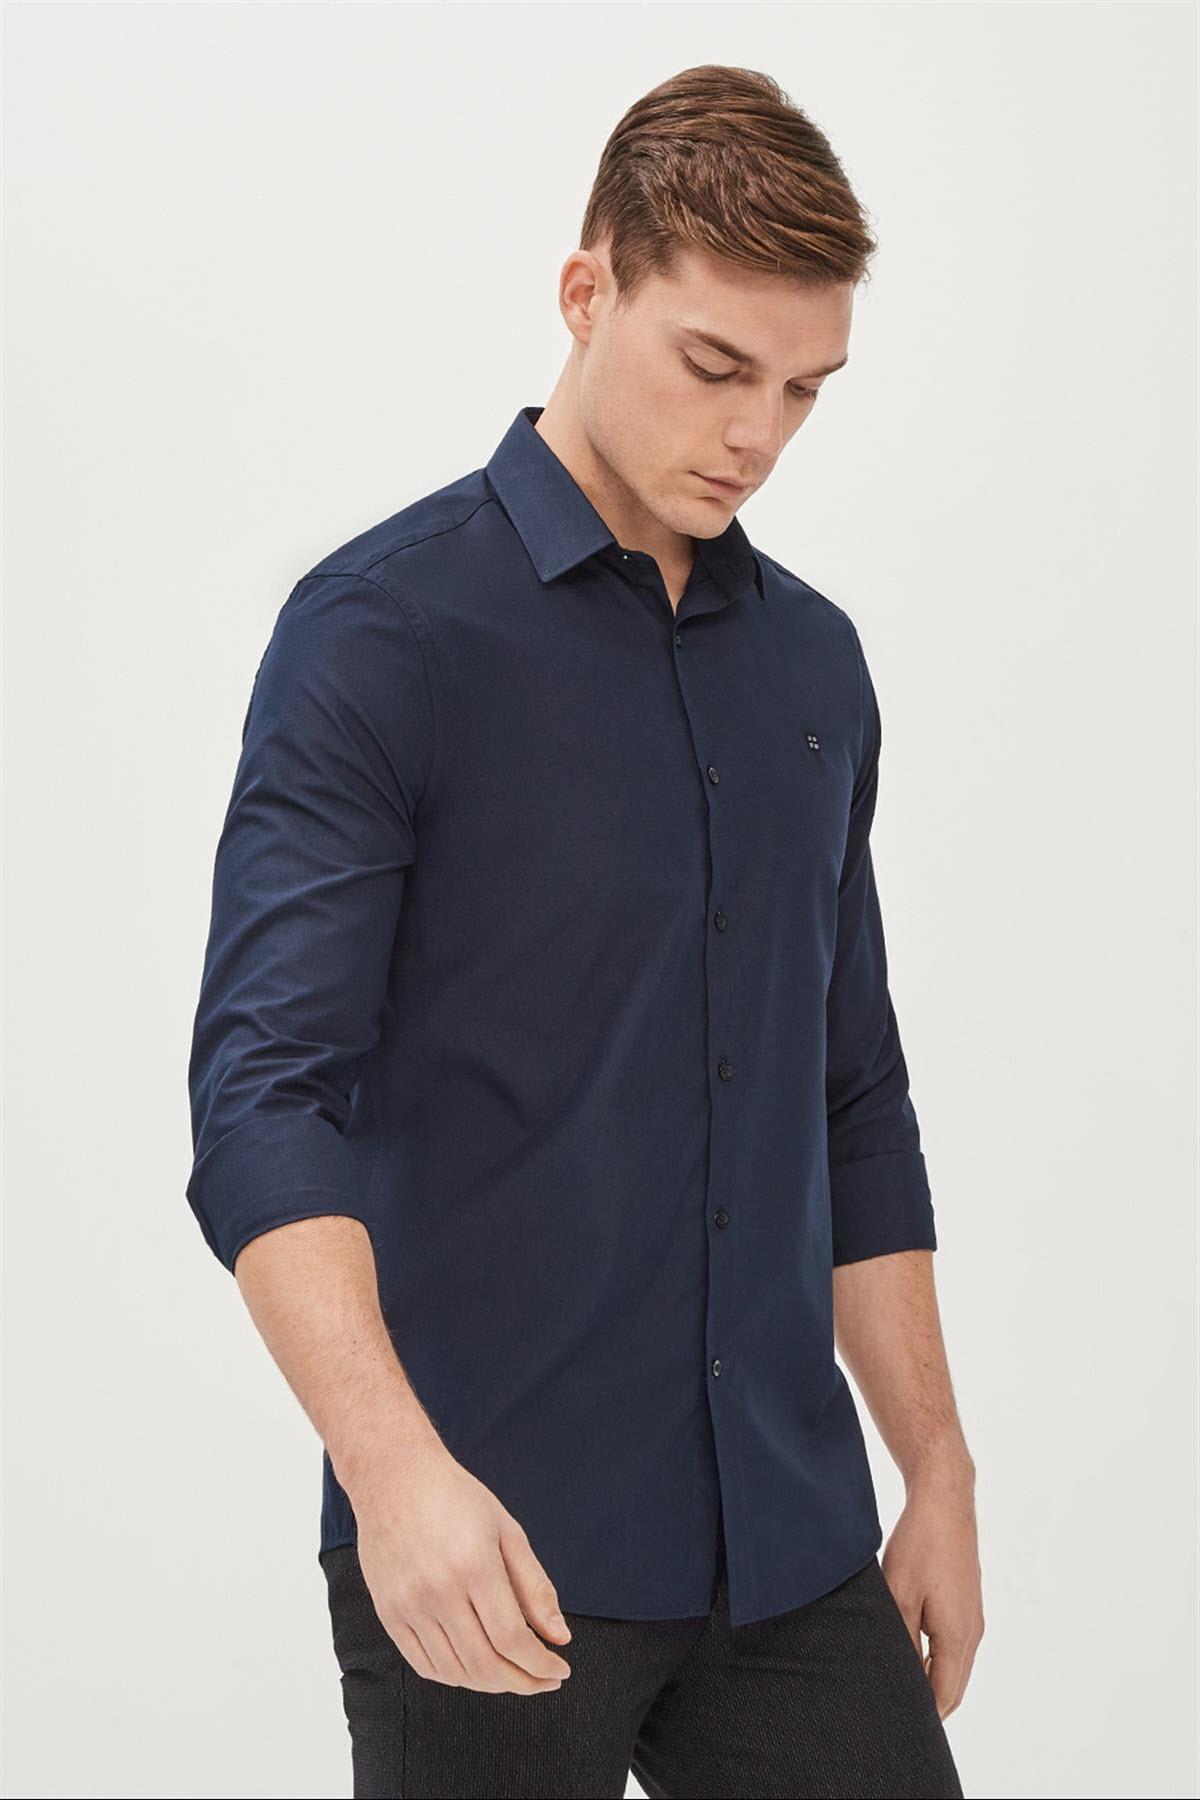 Avva Erkek Lacivert Düz Klasik Yaka Slim Fit Gömlek E002002 1